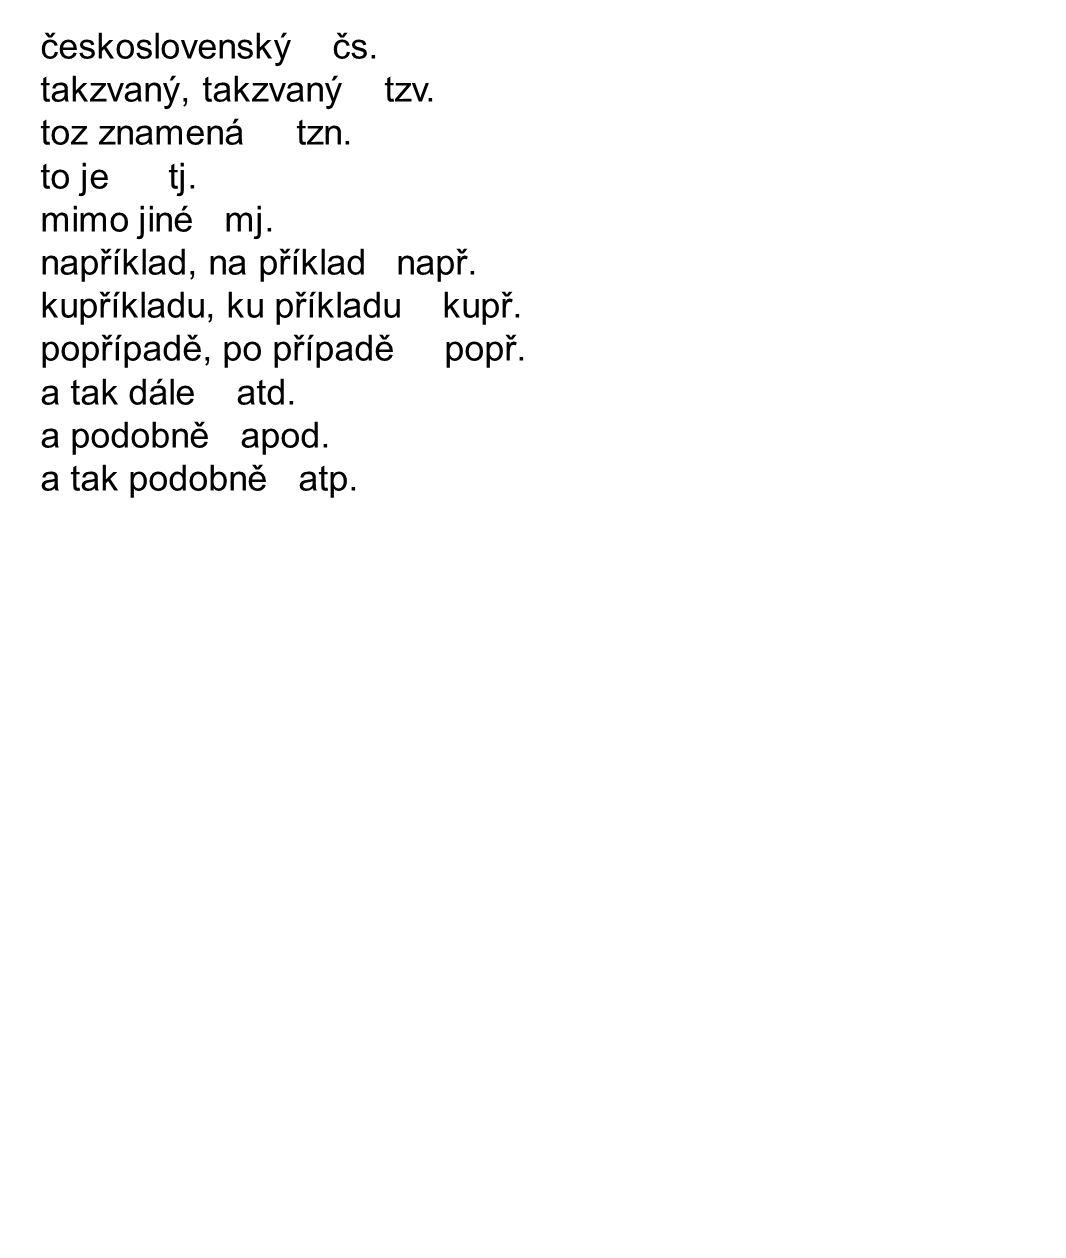 československý čs. takzvaný, takzvaný tzv. toz znamená tzn.